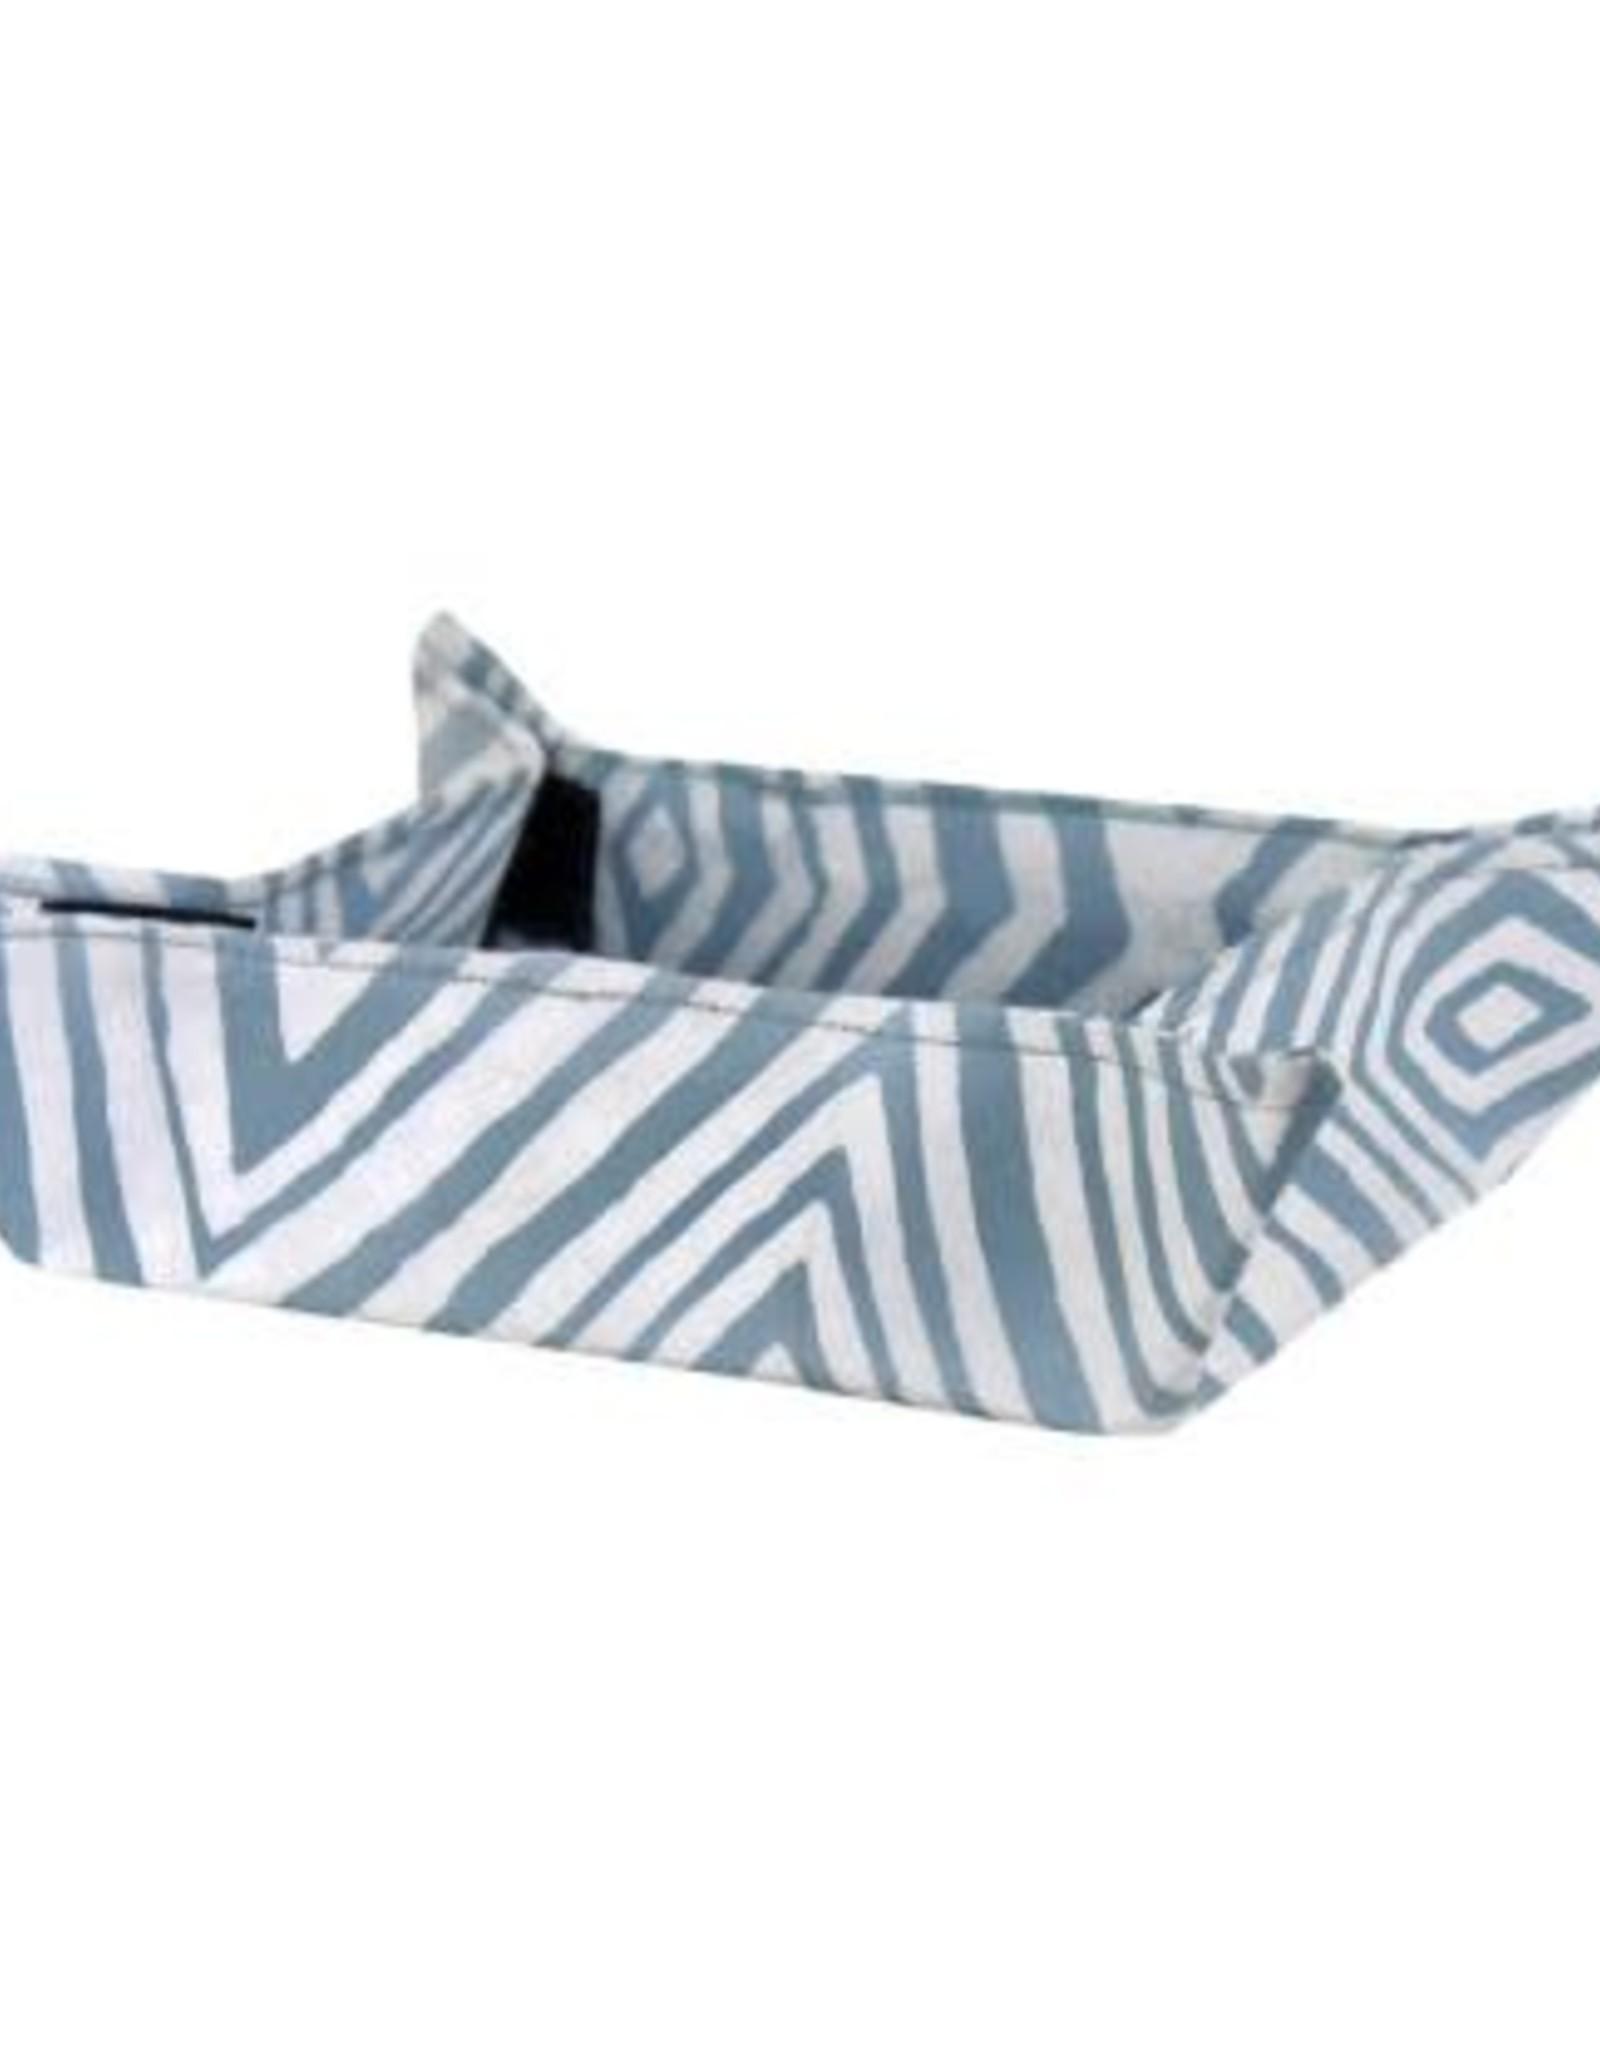 Velcro Basket, Diamond Silver